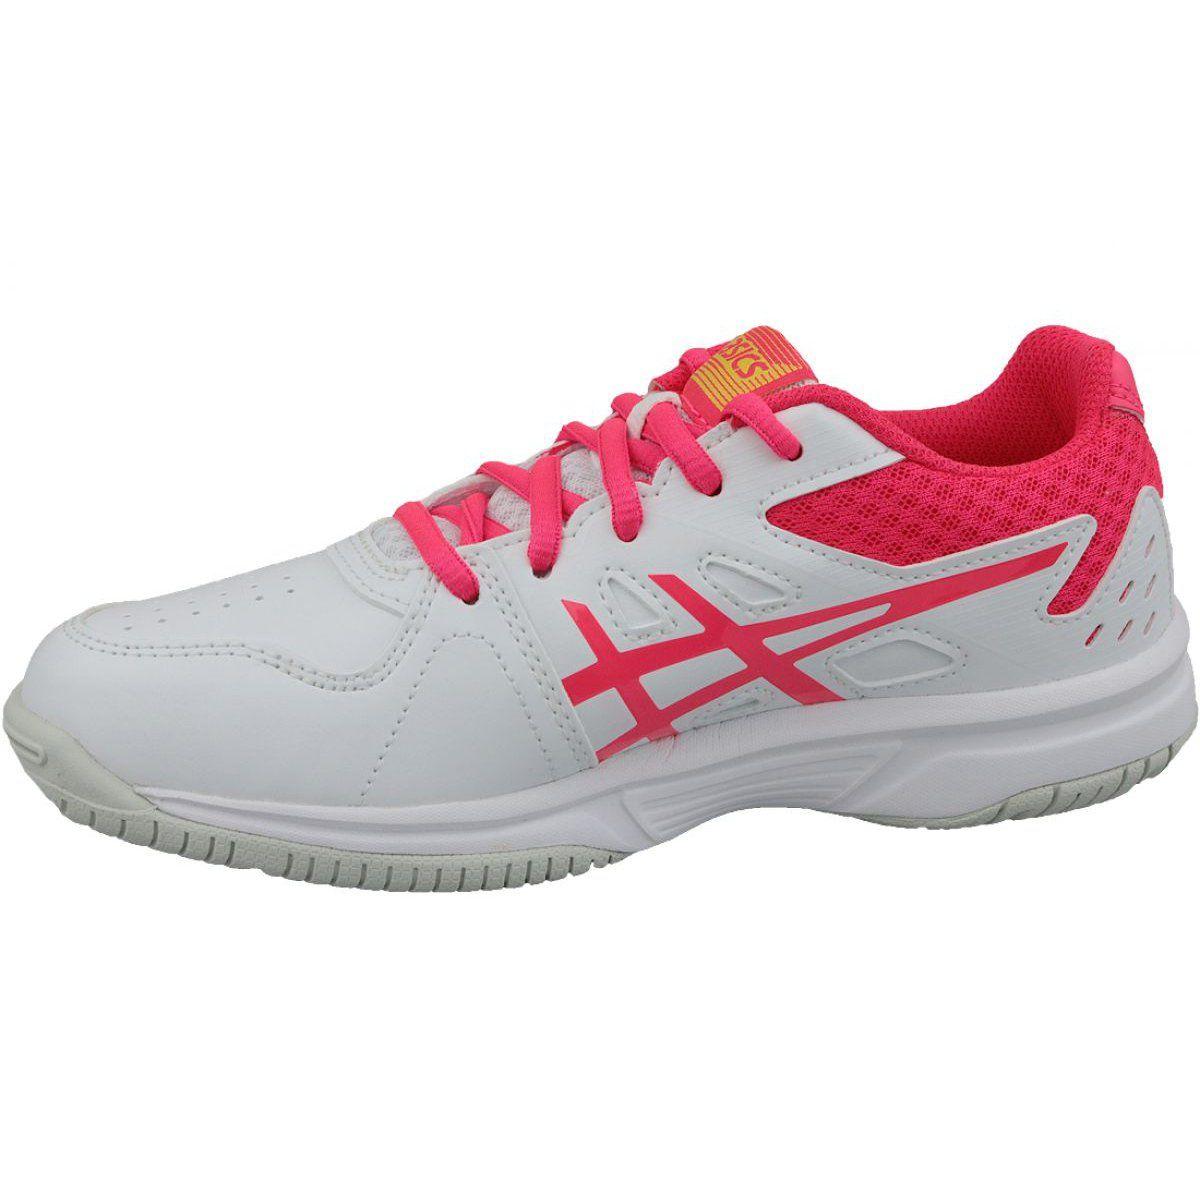 Asics Court Slide W 1042a030 101 Tennis Shoes White Womens Tennis Shoes Tennis Shoes Asics